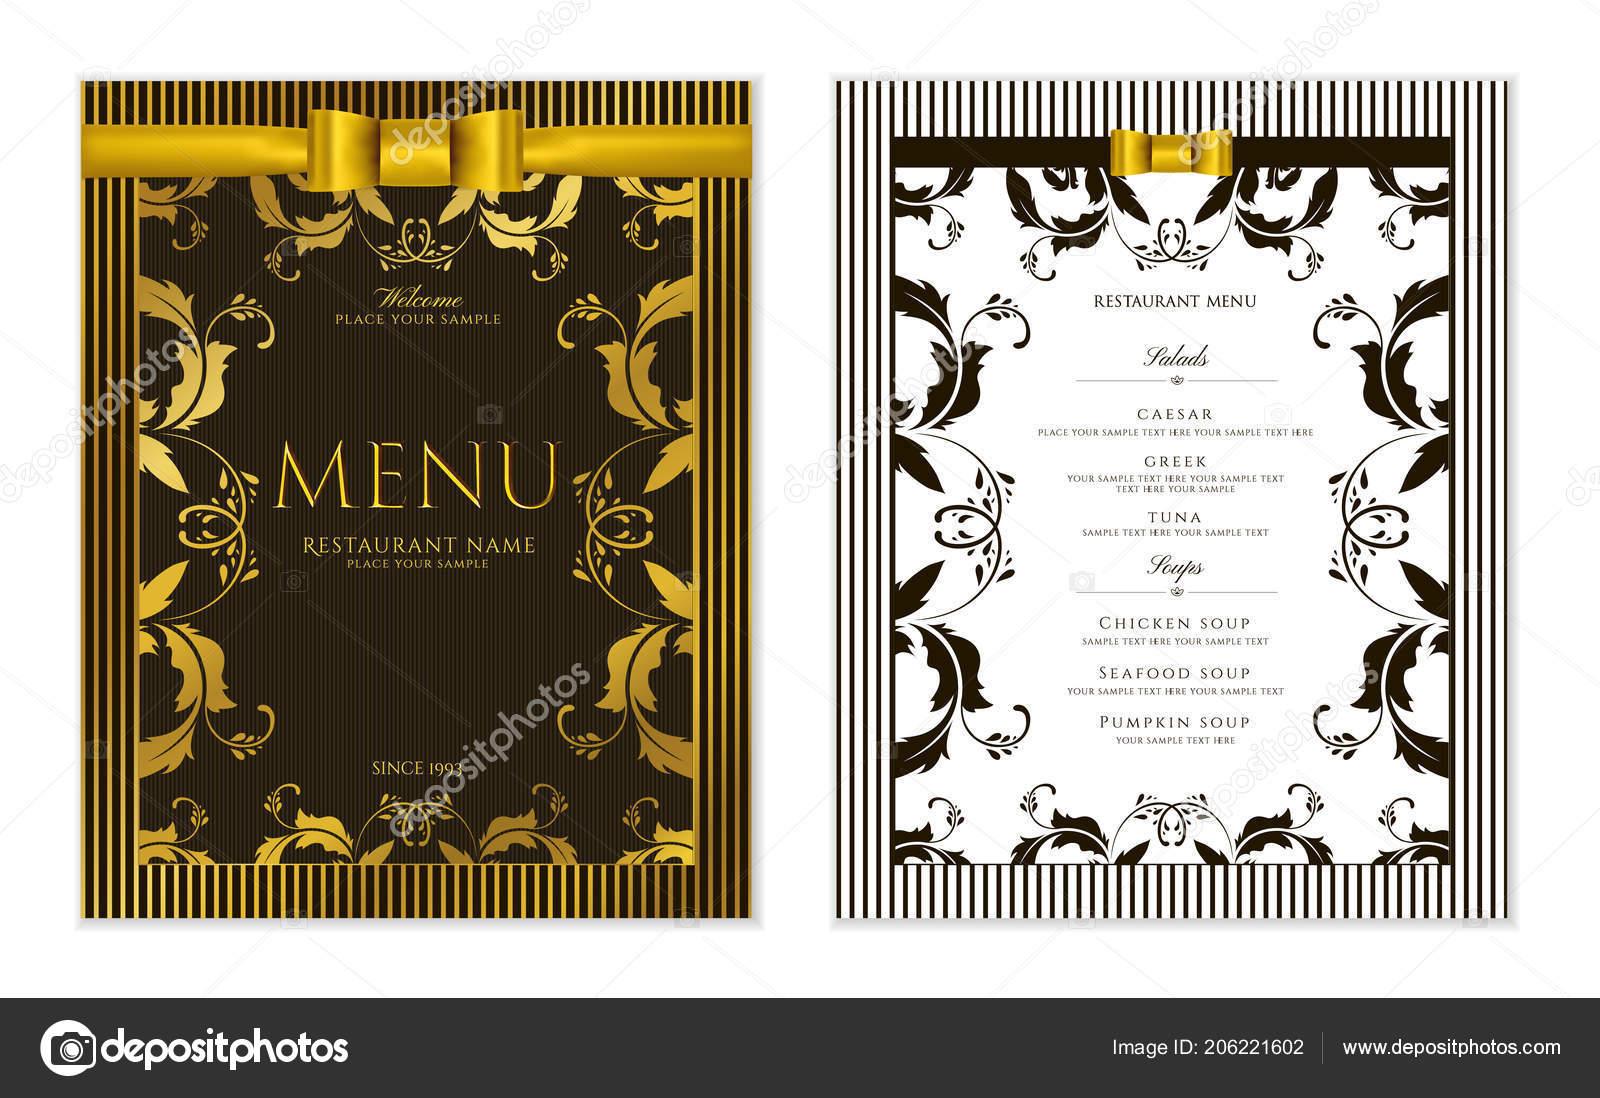 Design restaurant menu template gold floral border frame black design restaurant menu template gold floral border frame black stripy vetor de stock stopboris Images